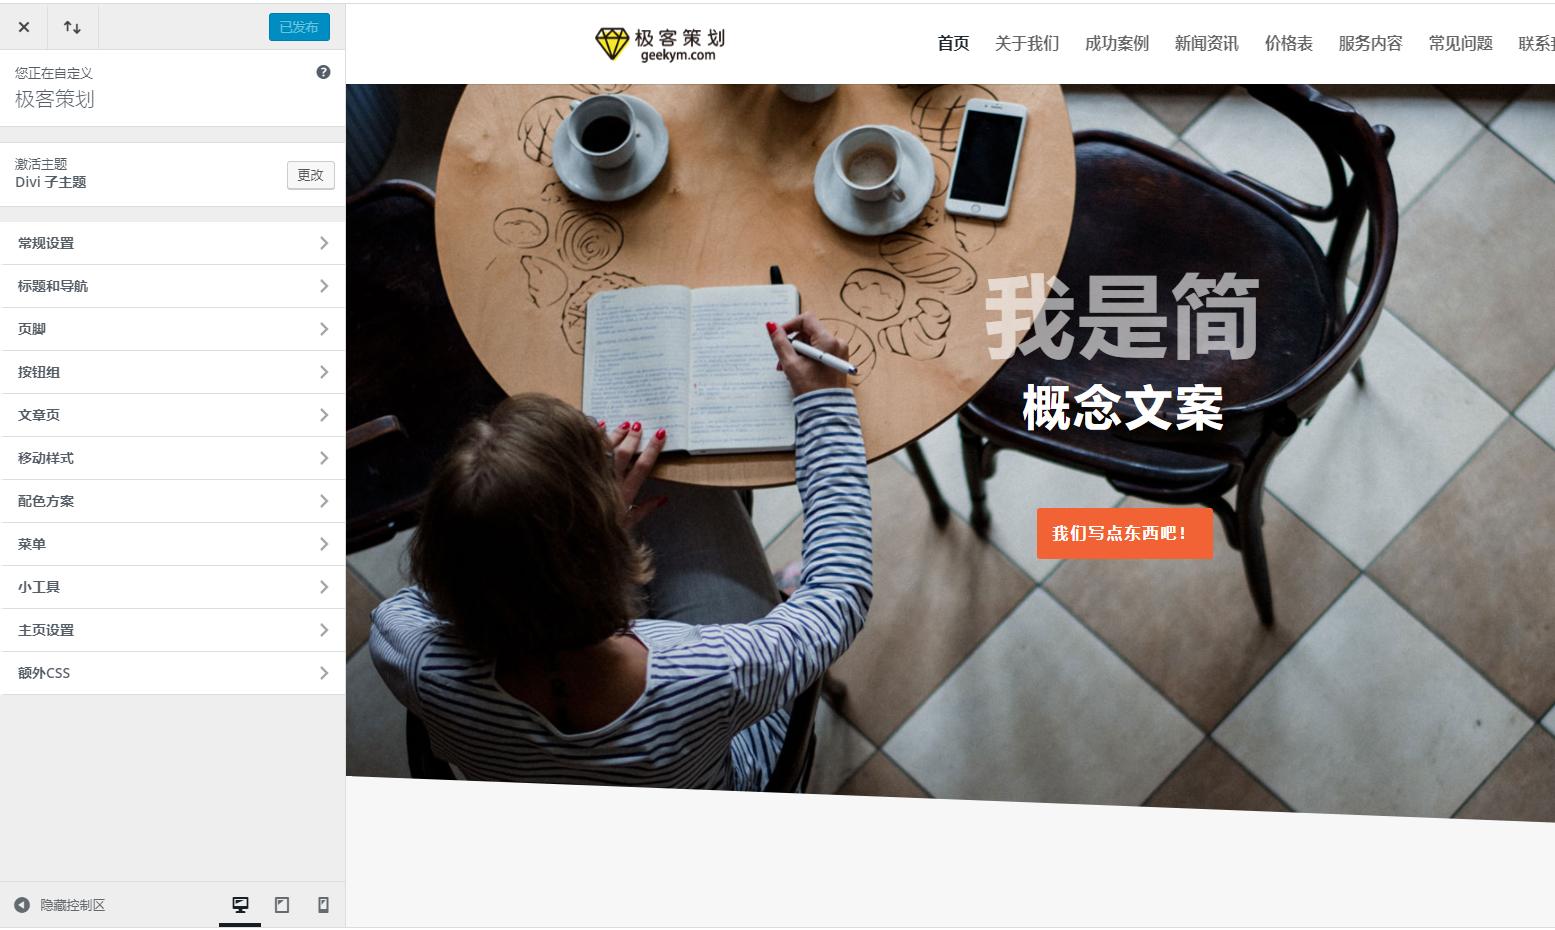 wordpress主题广告文案策划公司工作室响应式多语言企业网站Divi